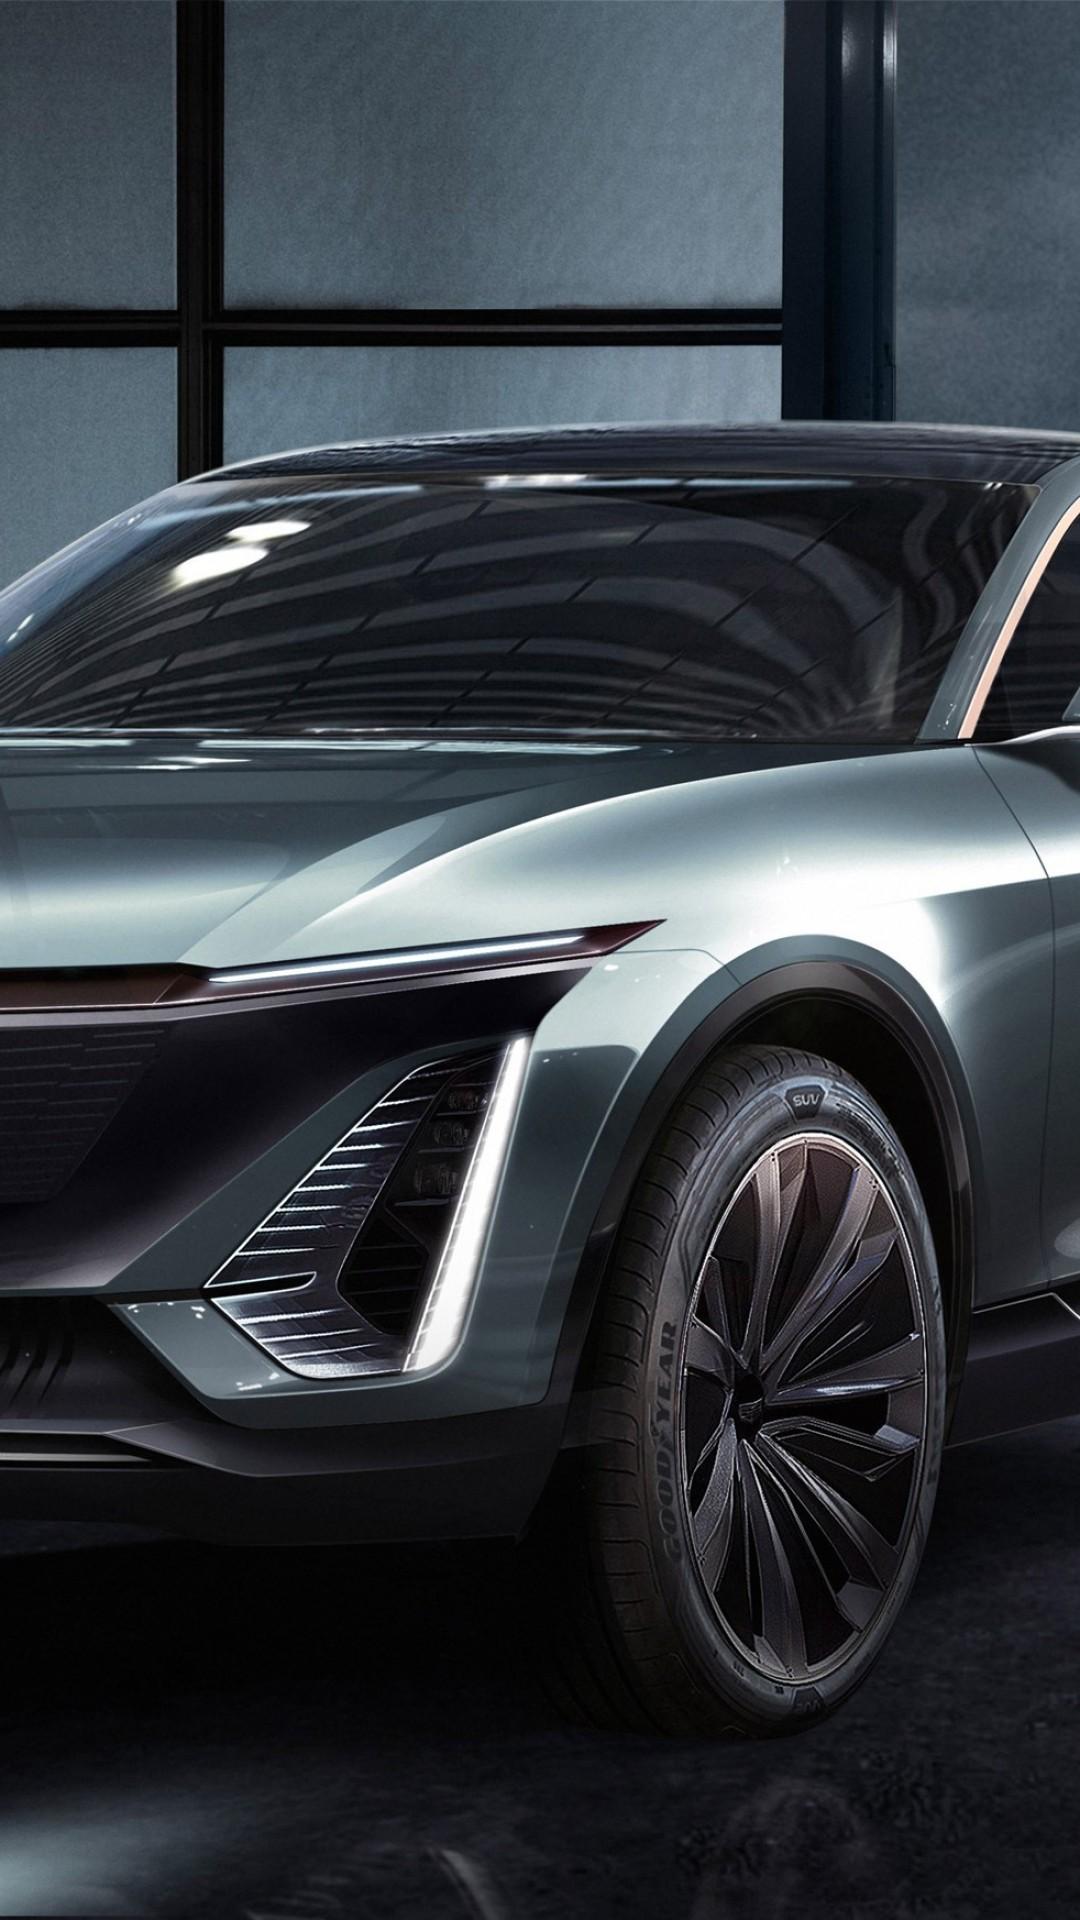 Wallpaper Cadillac Ev Suv 2019 Cars 2019 Detroit Auto